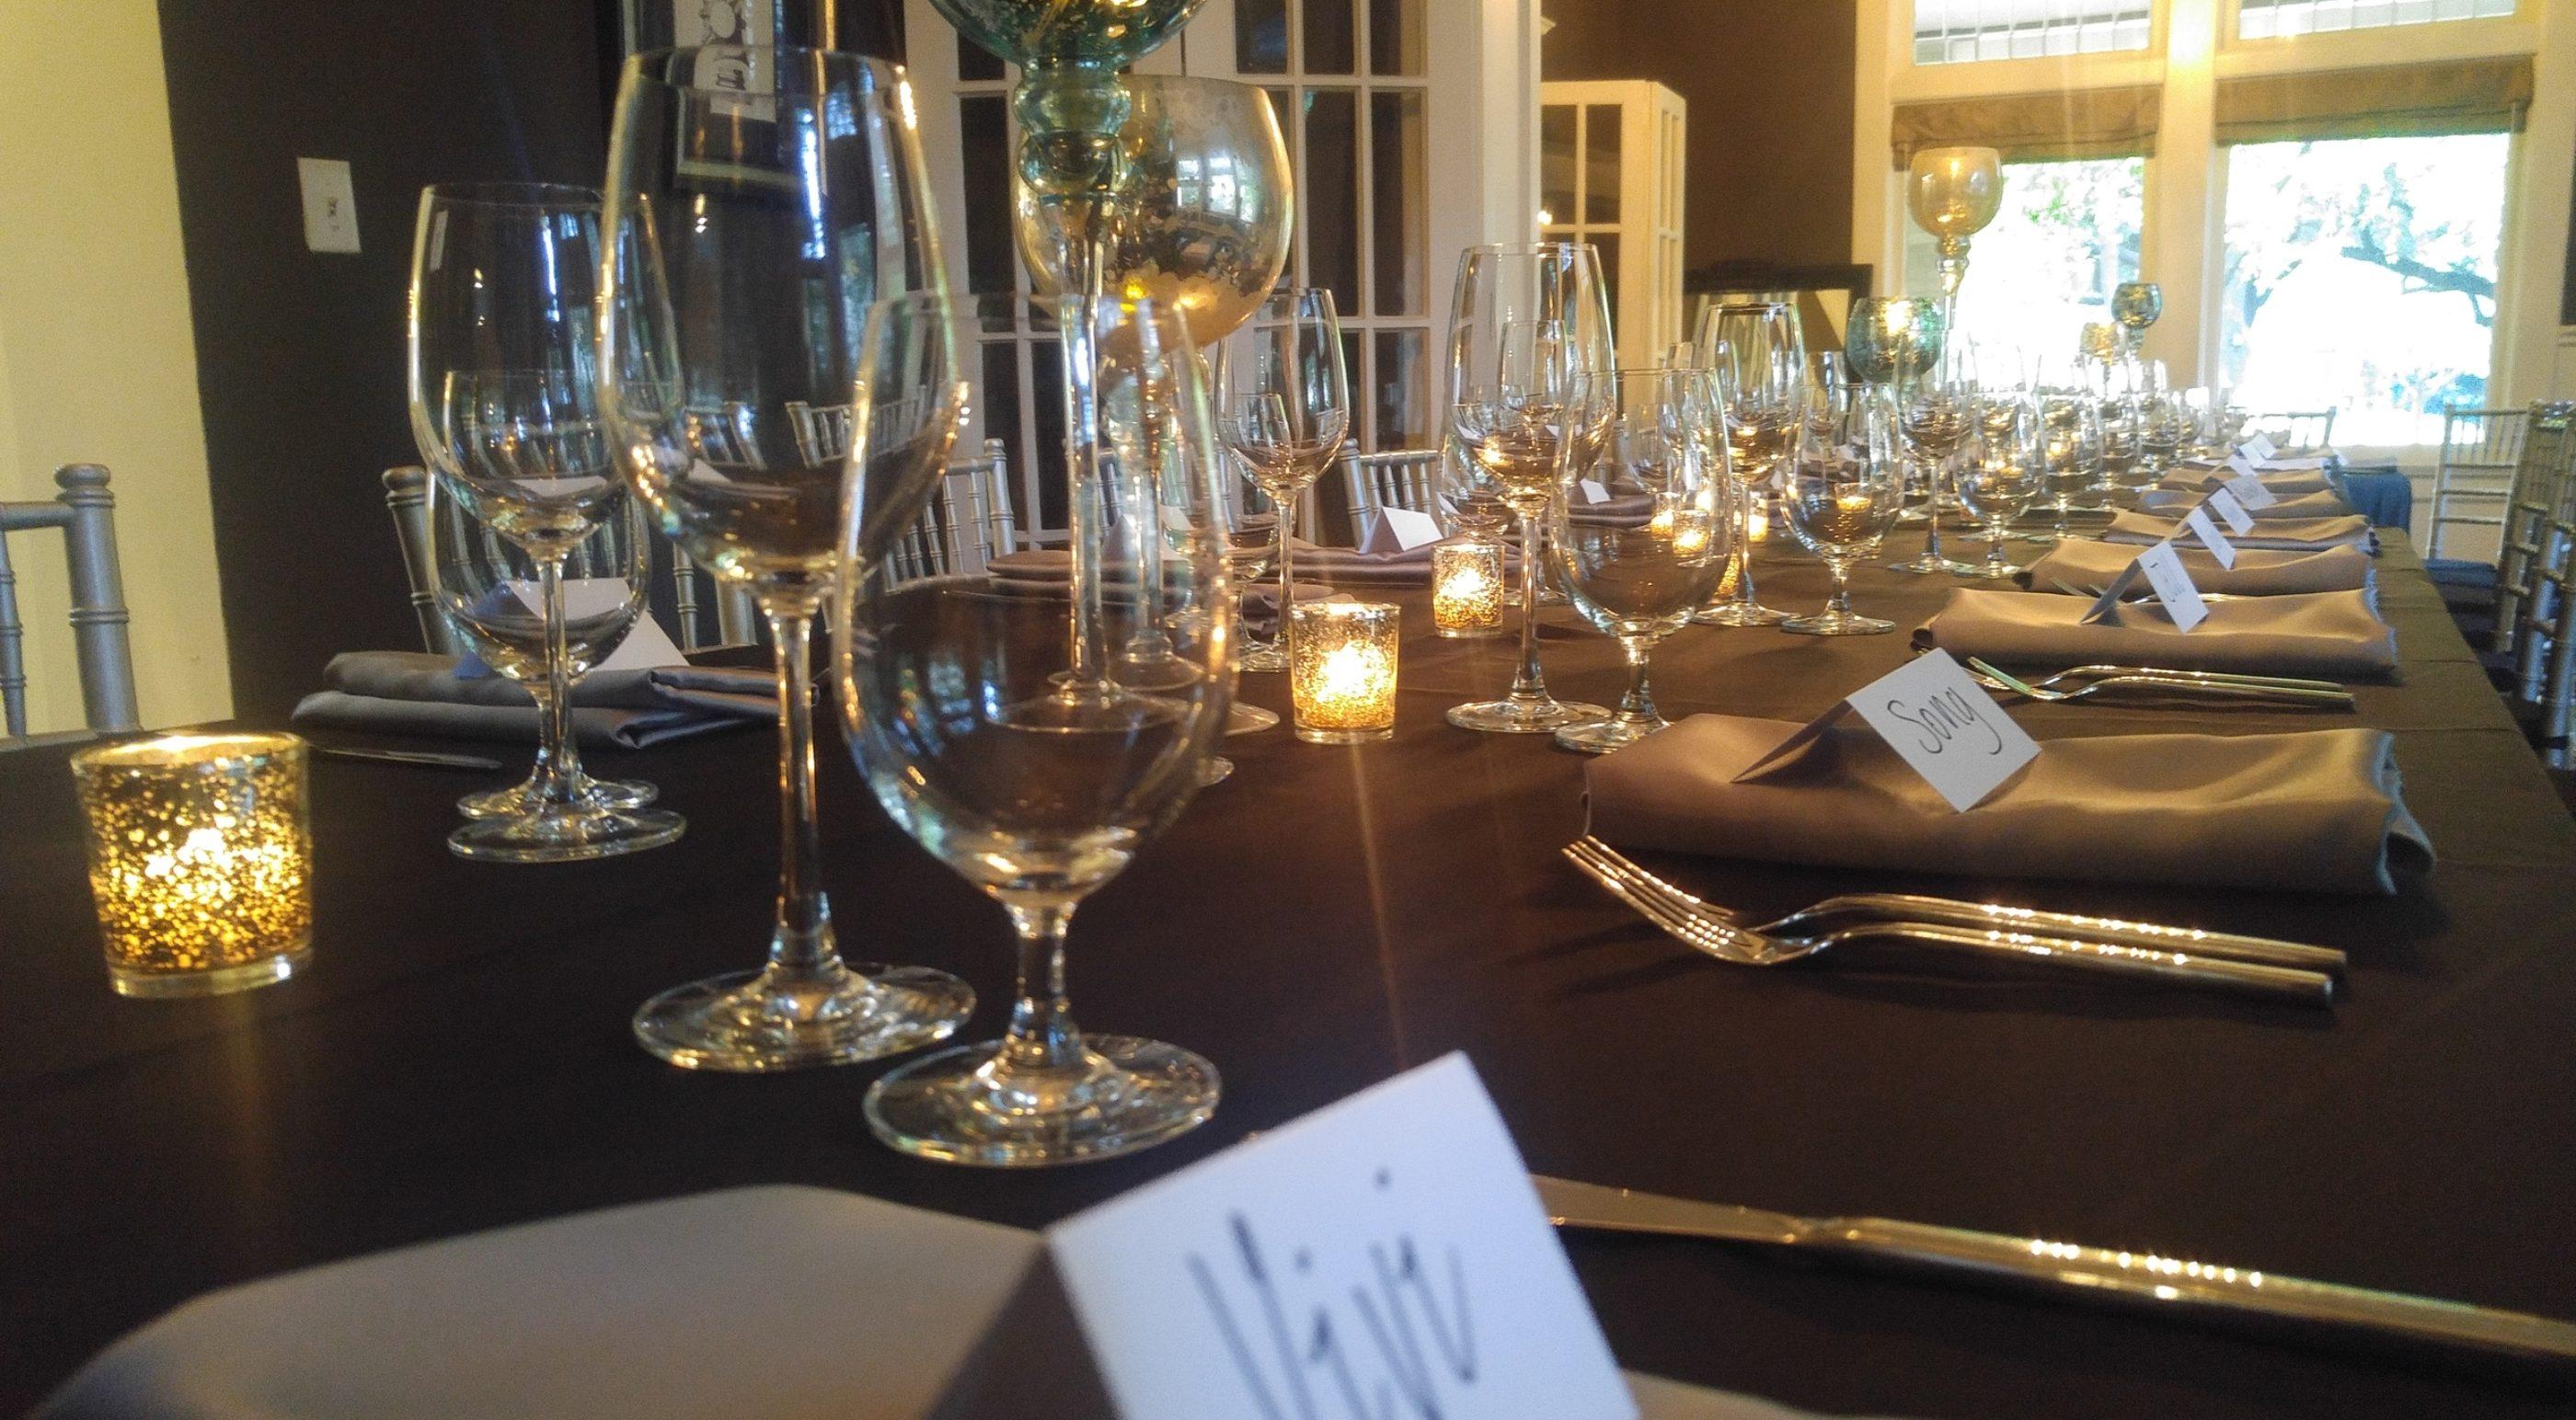 Viviane's Table